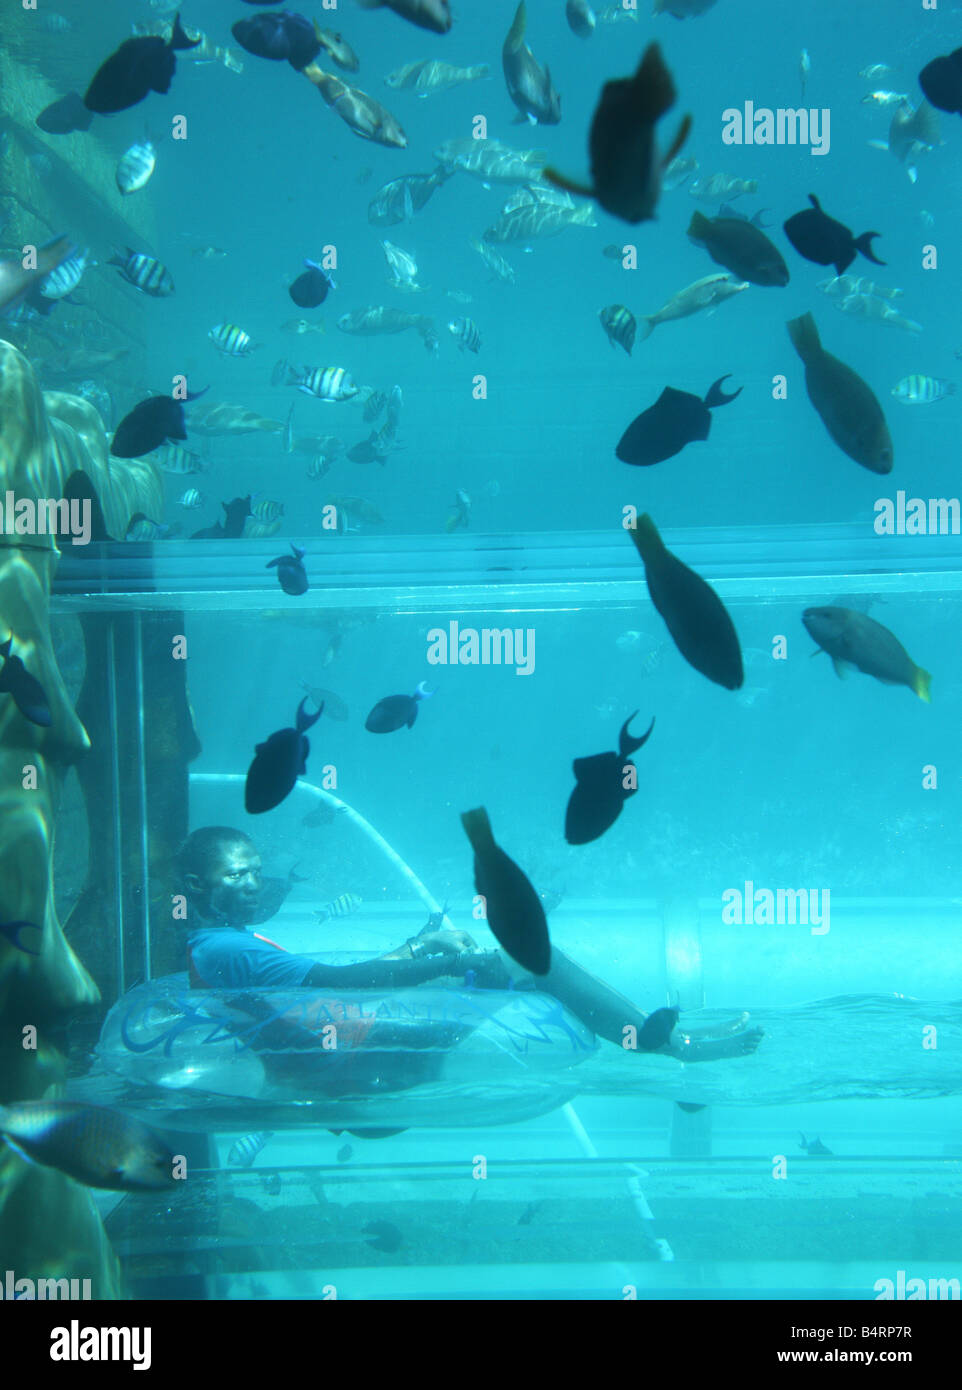 atlantis hotel the palm dubai united arab emirates water fun park aquaventure underwater water slide atlantis e40 underwater